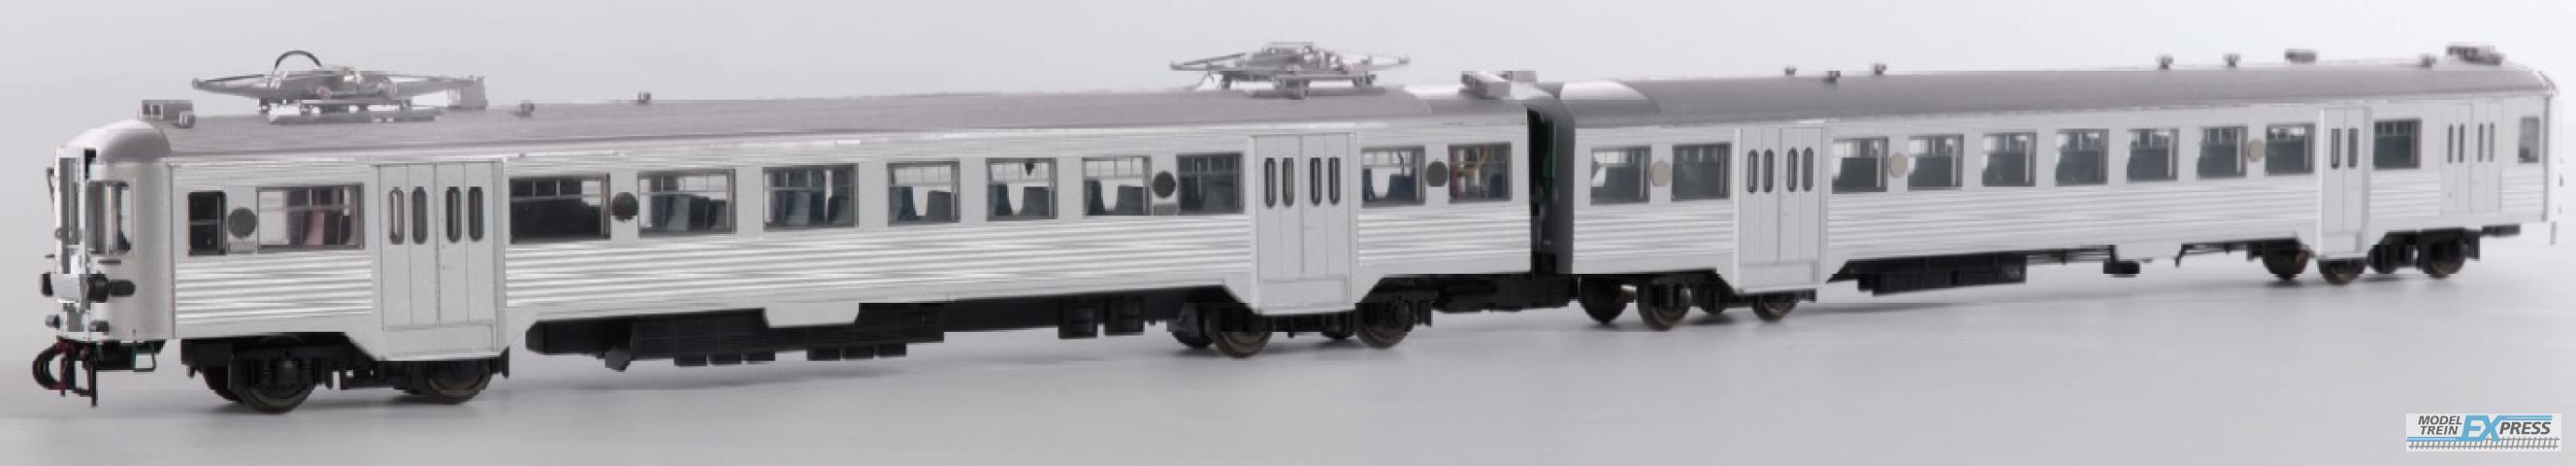 B-Models 7101.04L